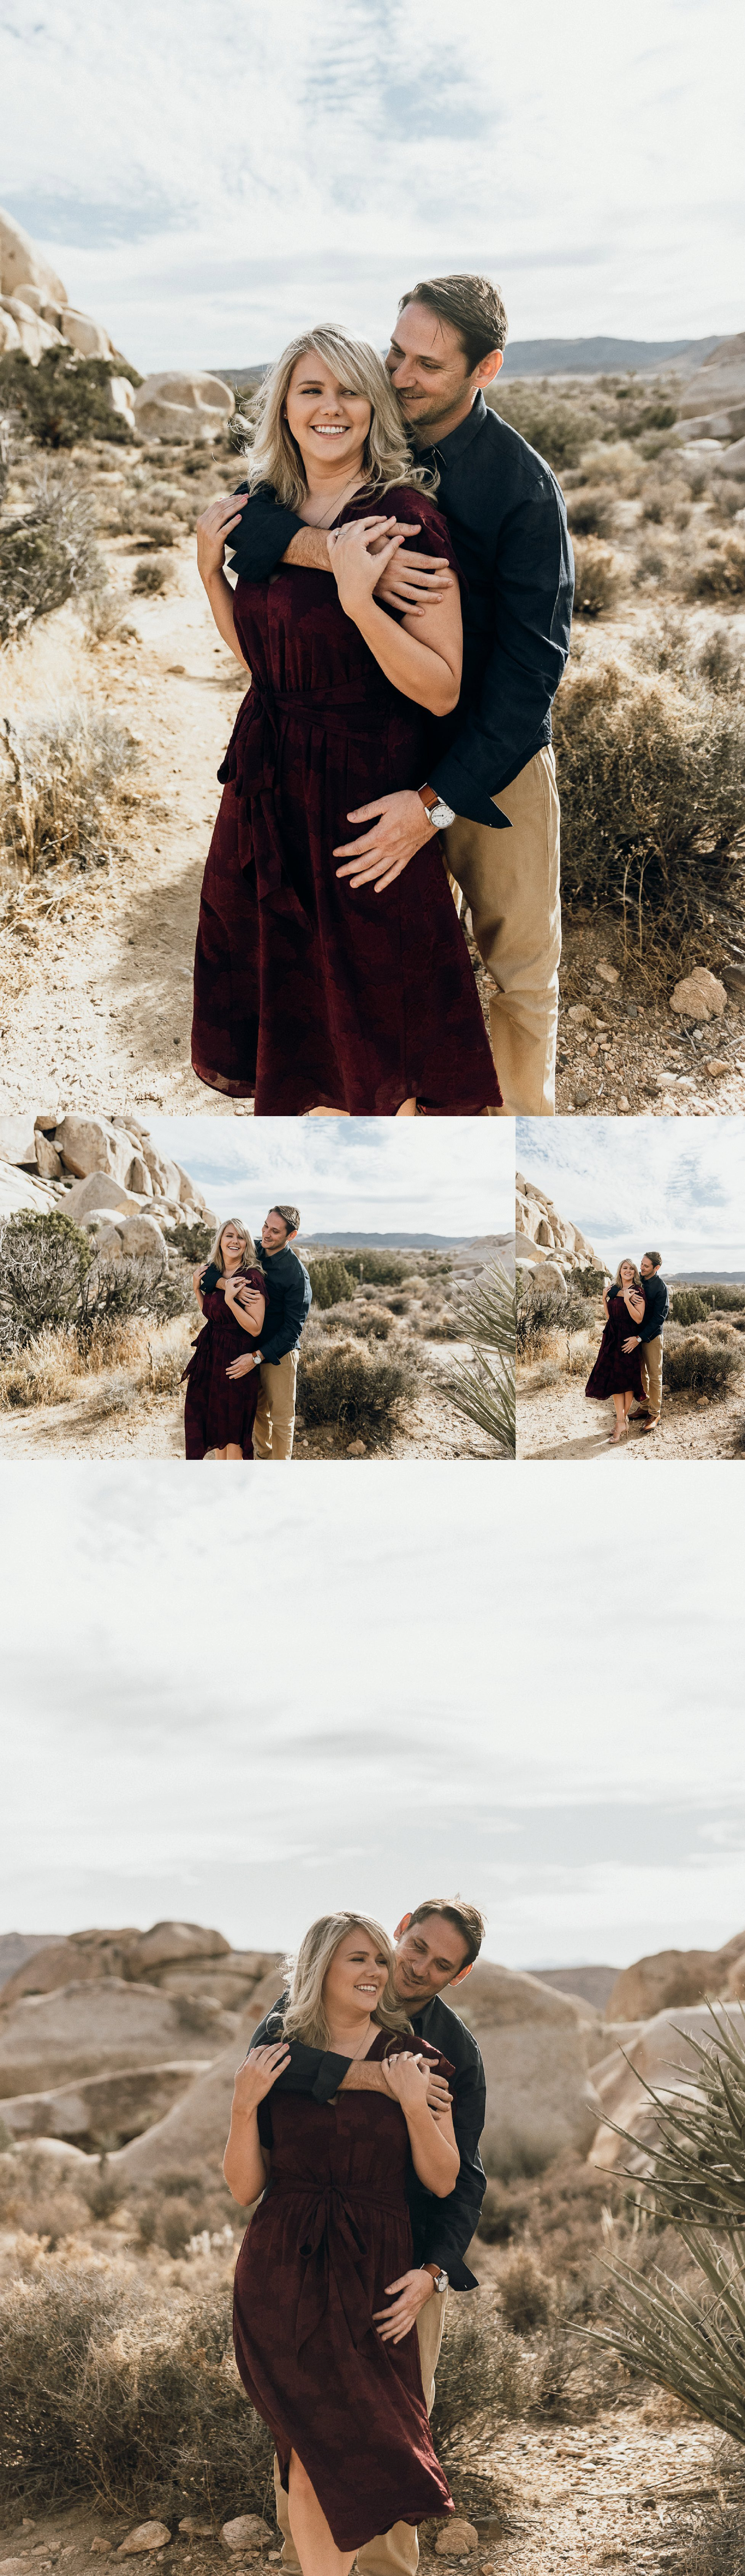 San Diego Engagement Photography - Joshua Tree_0130.jpg